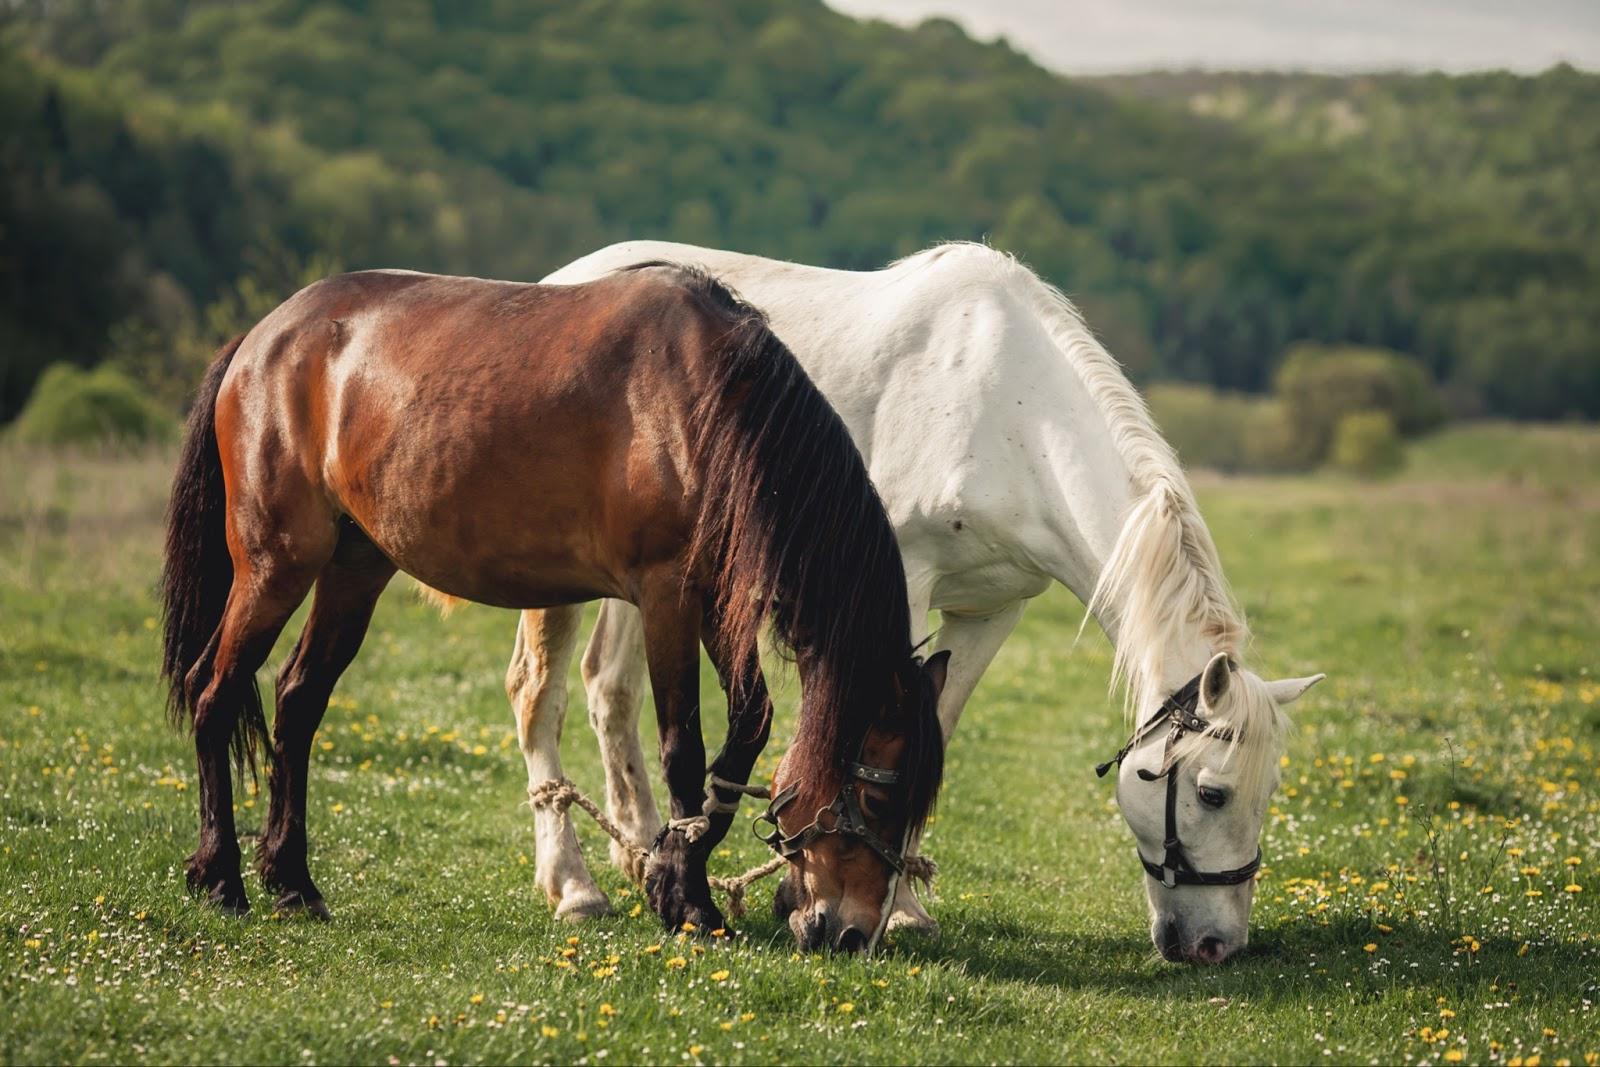 horses healthy grazing